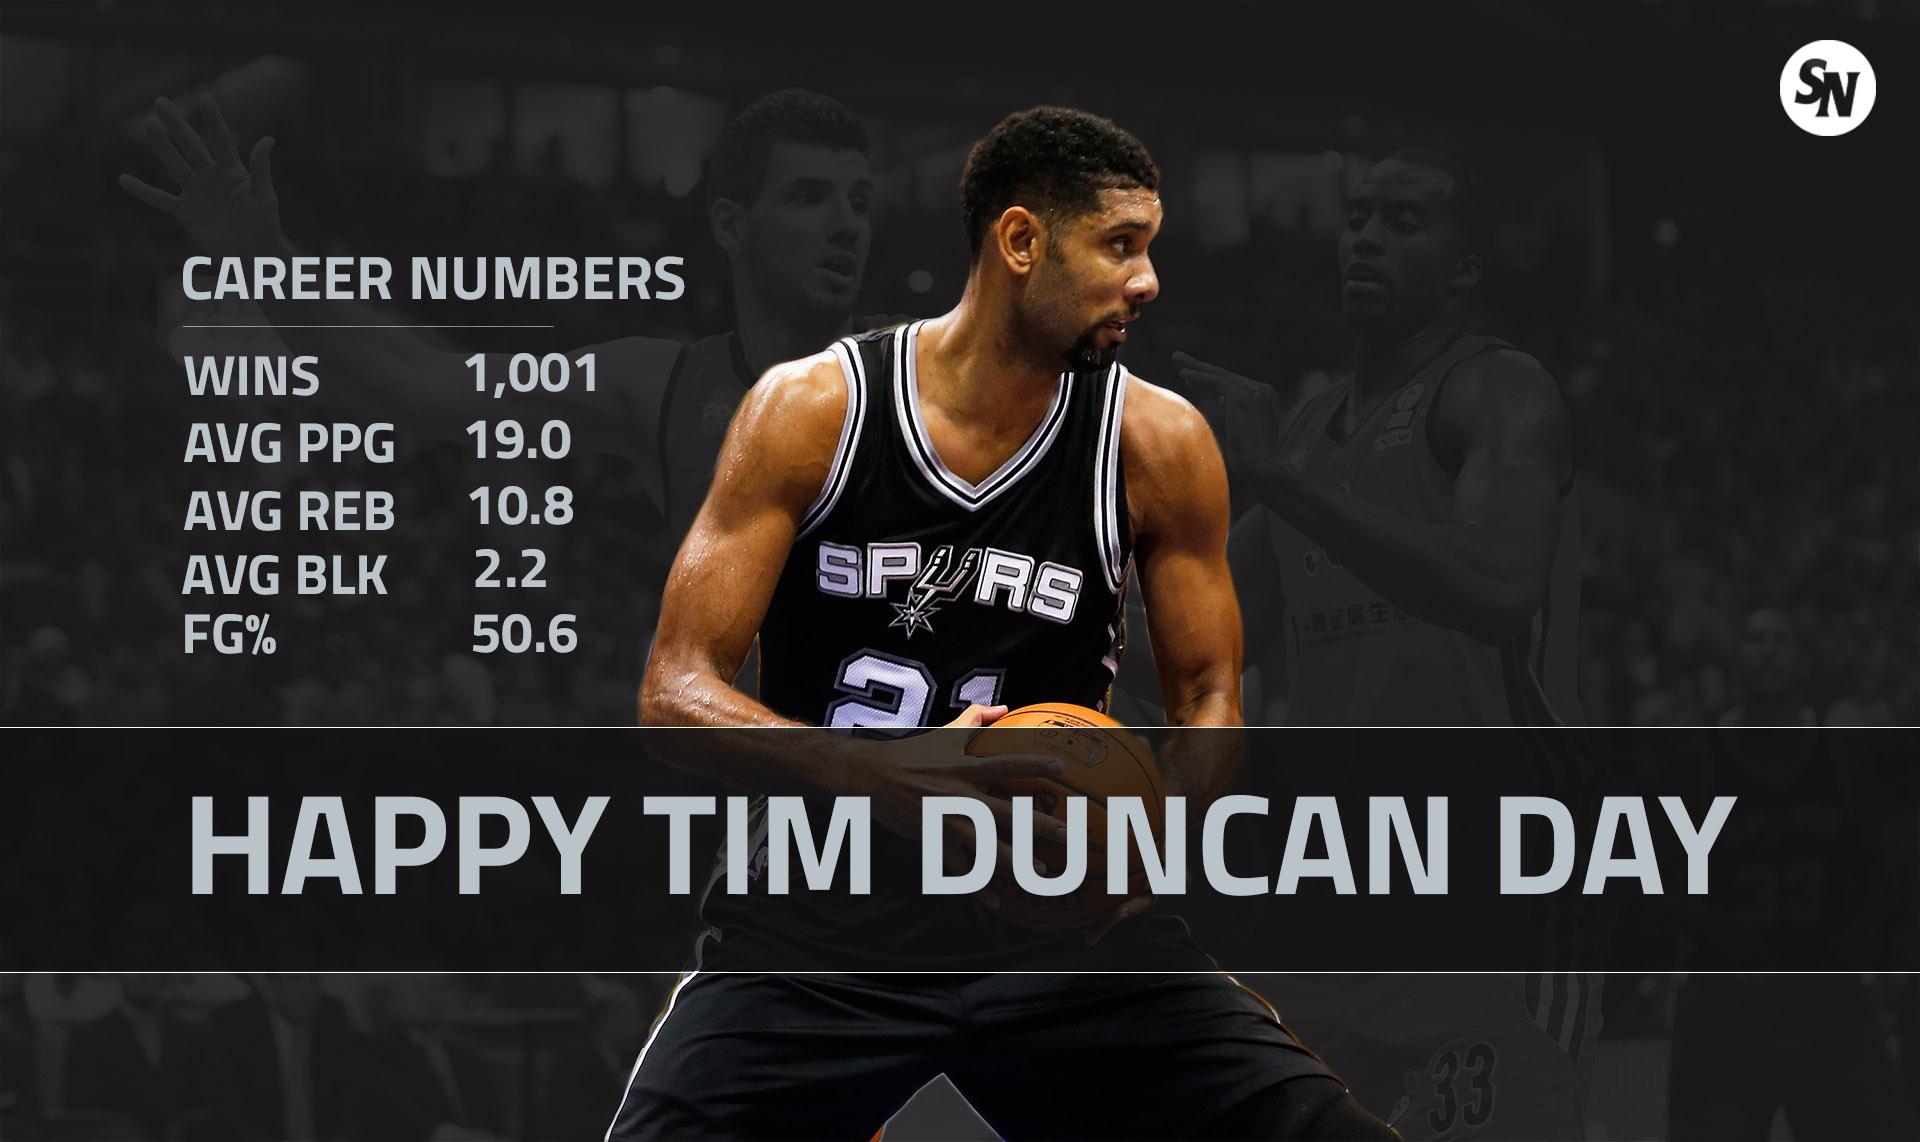 San Antonio PD FD honor a legend on Tim Duncan Day